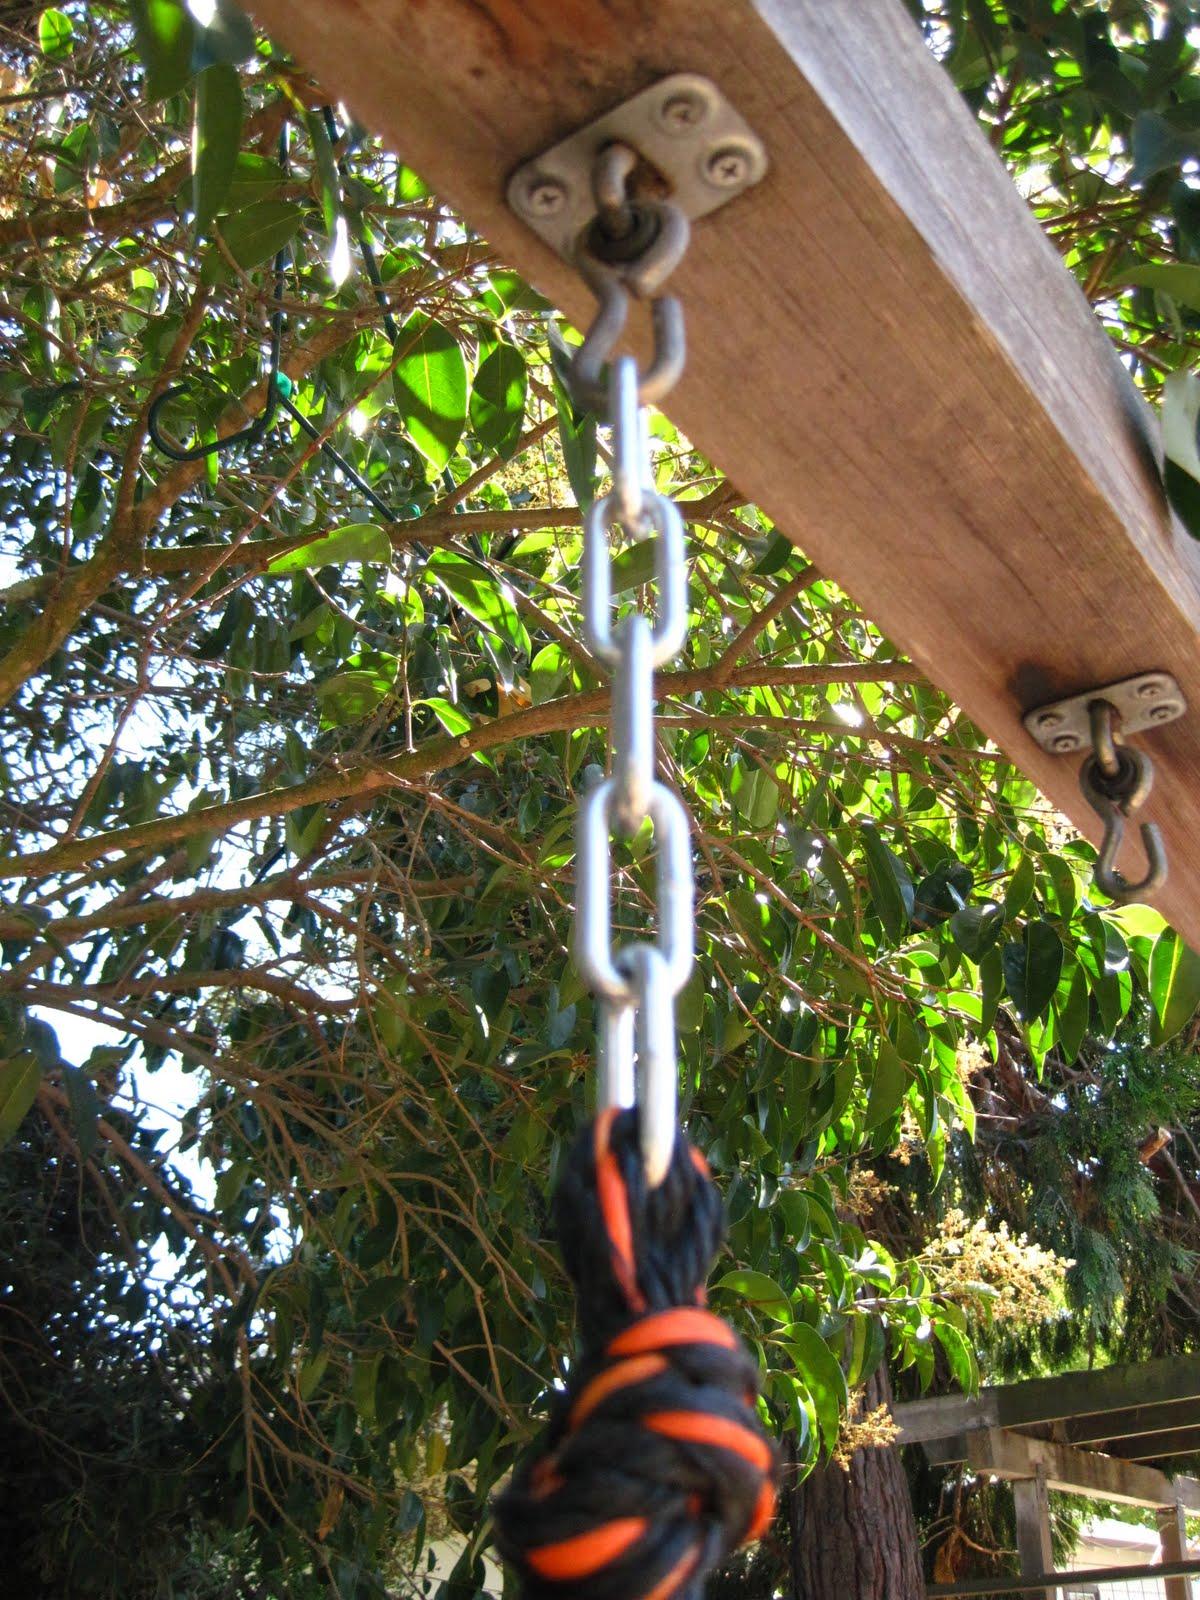 Storing Up My Treasures Diy Platform Swing Glider